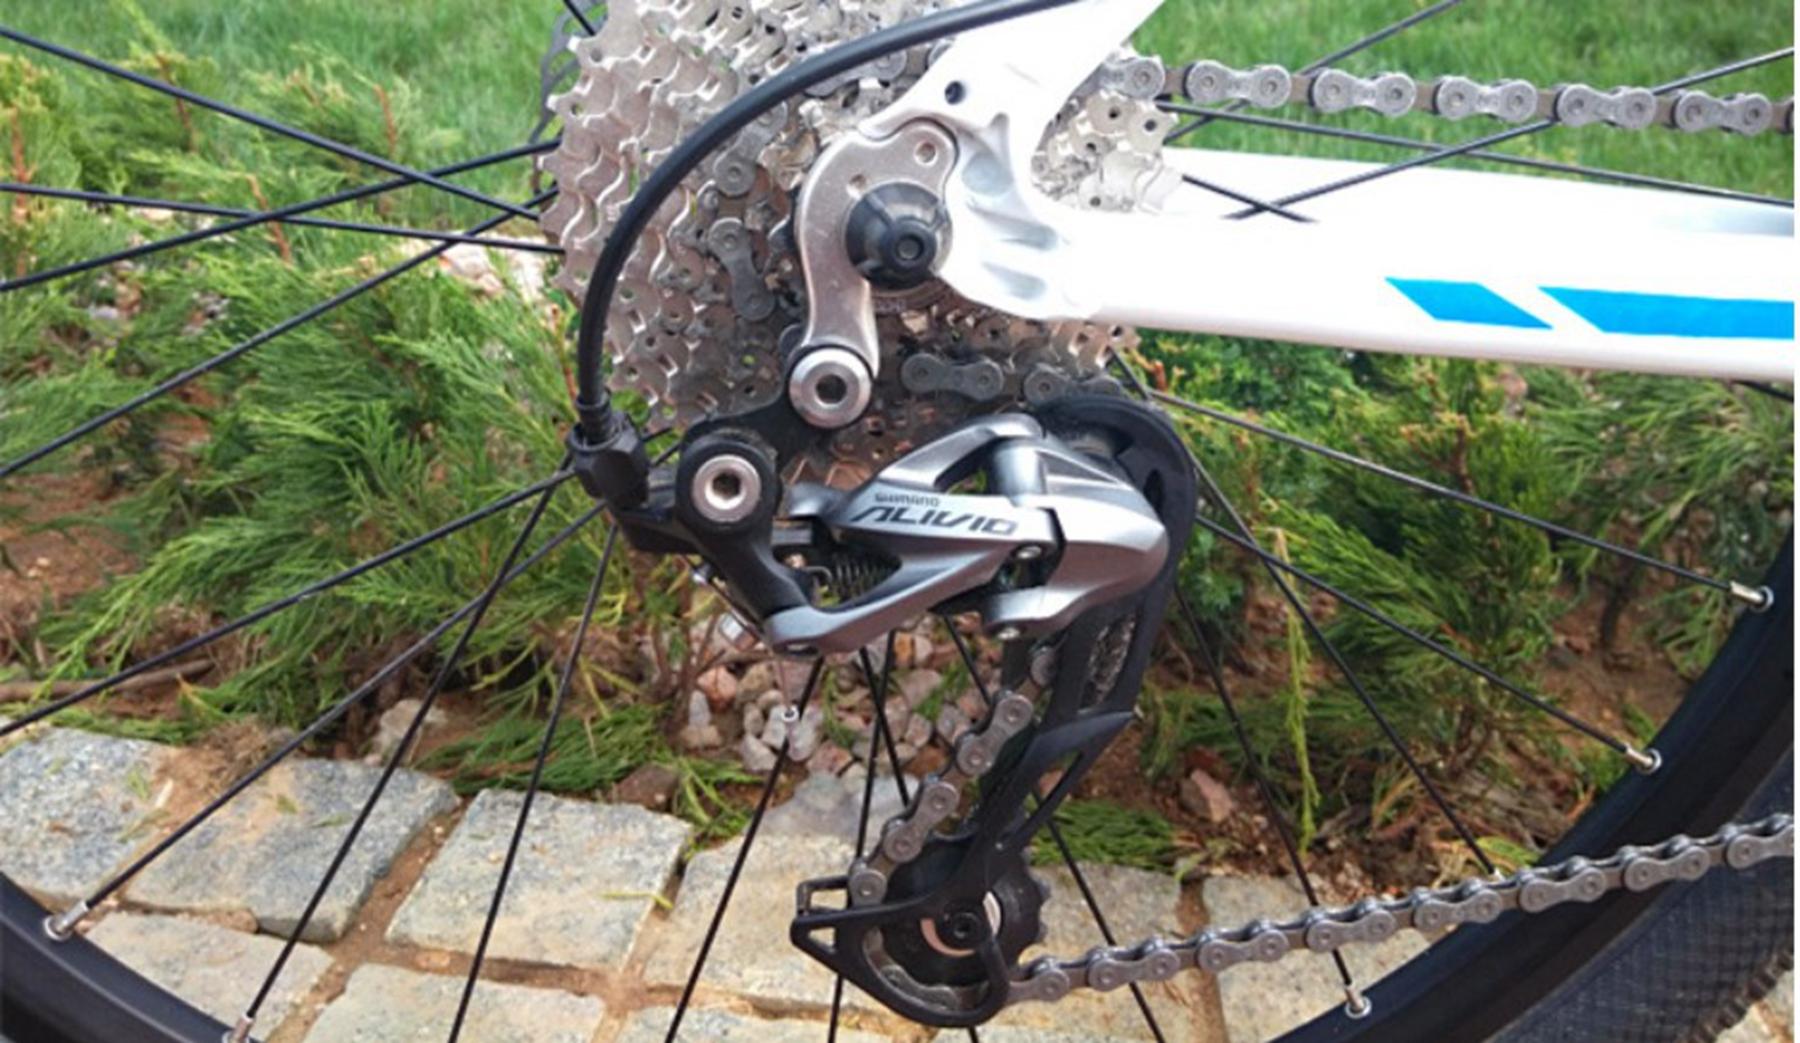 NEW Shimano Alivio RD-M4000 9 Speed Mountain Bike Rear Derailleur